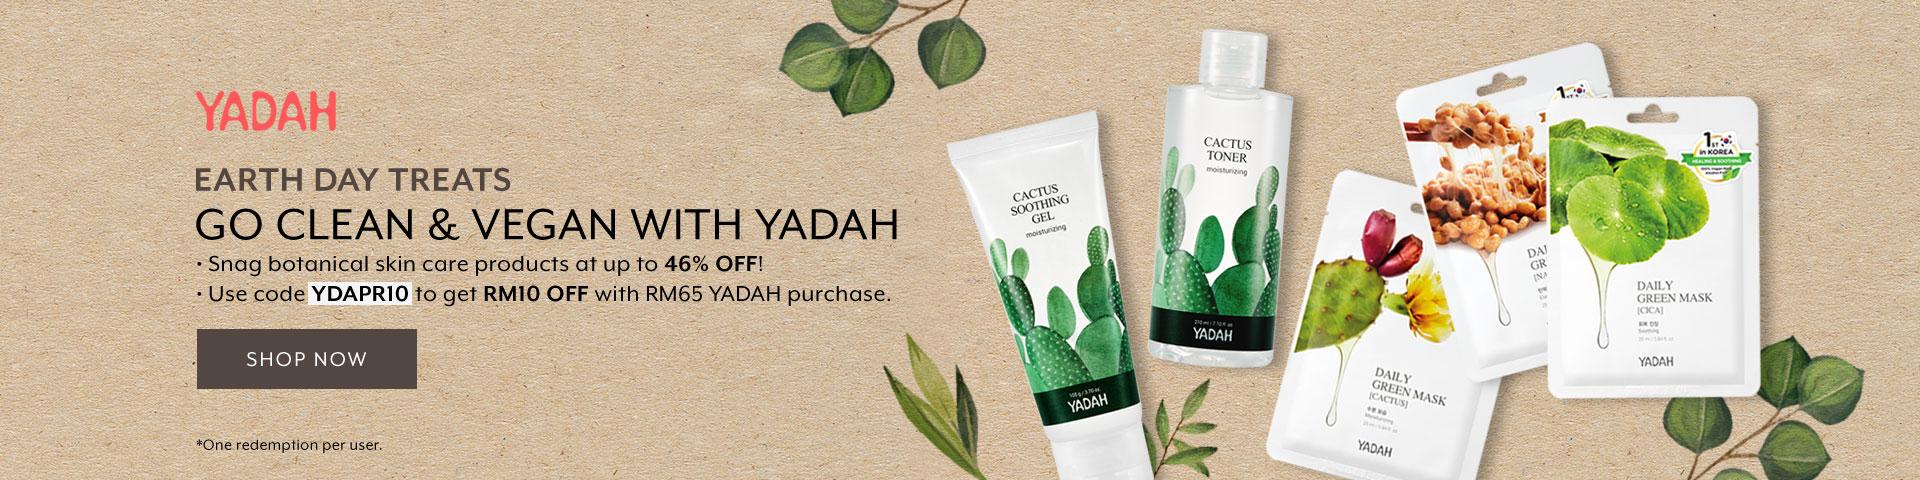 Apr 2019: Yadah Earth Day